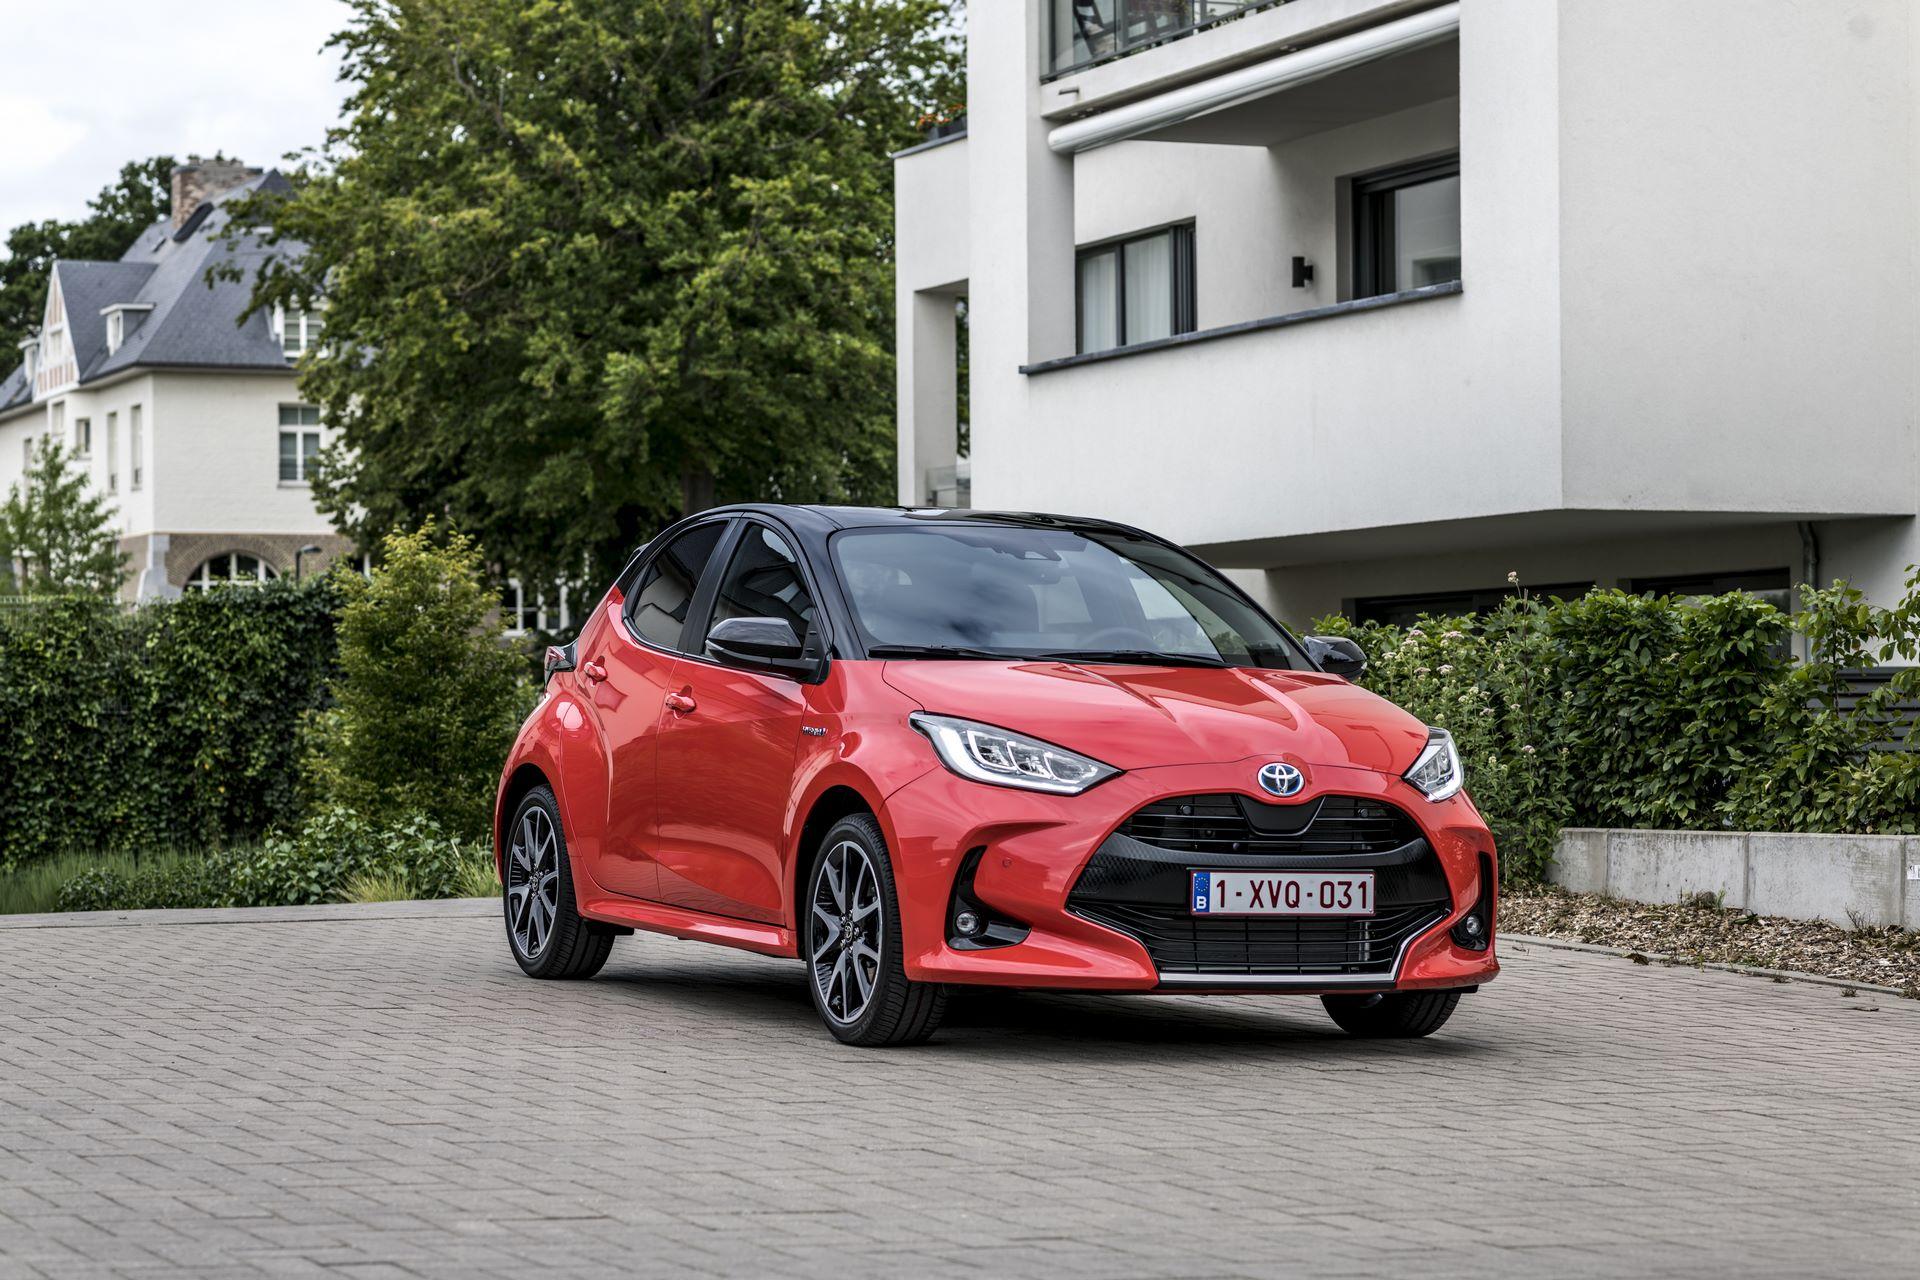 Toyota-Yaris-2020-79